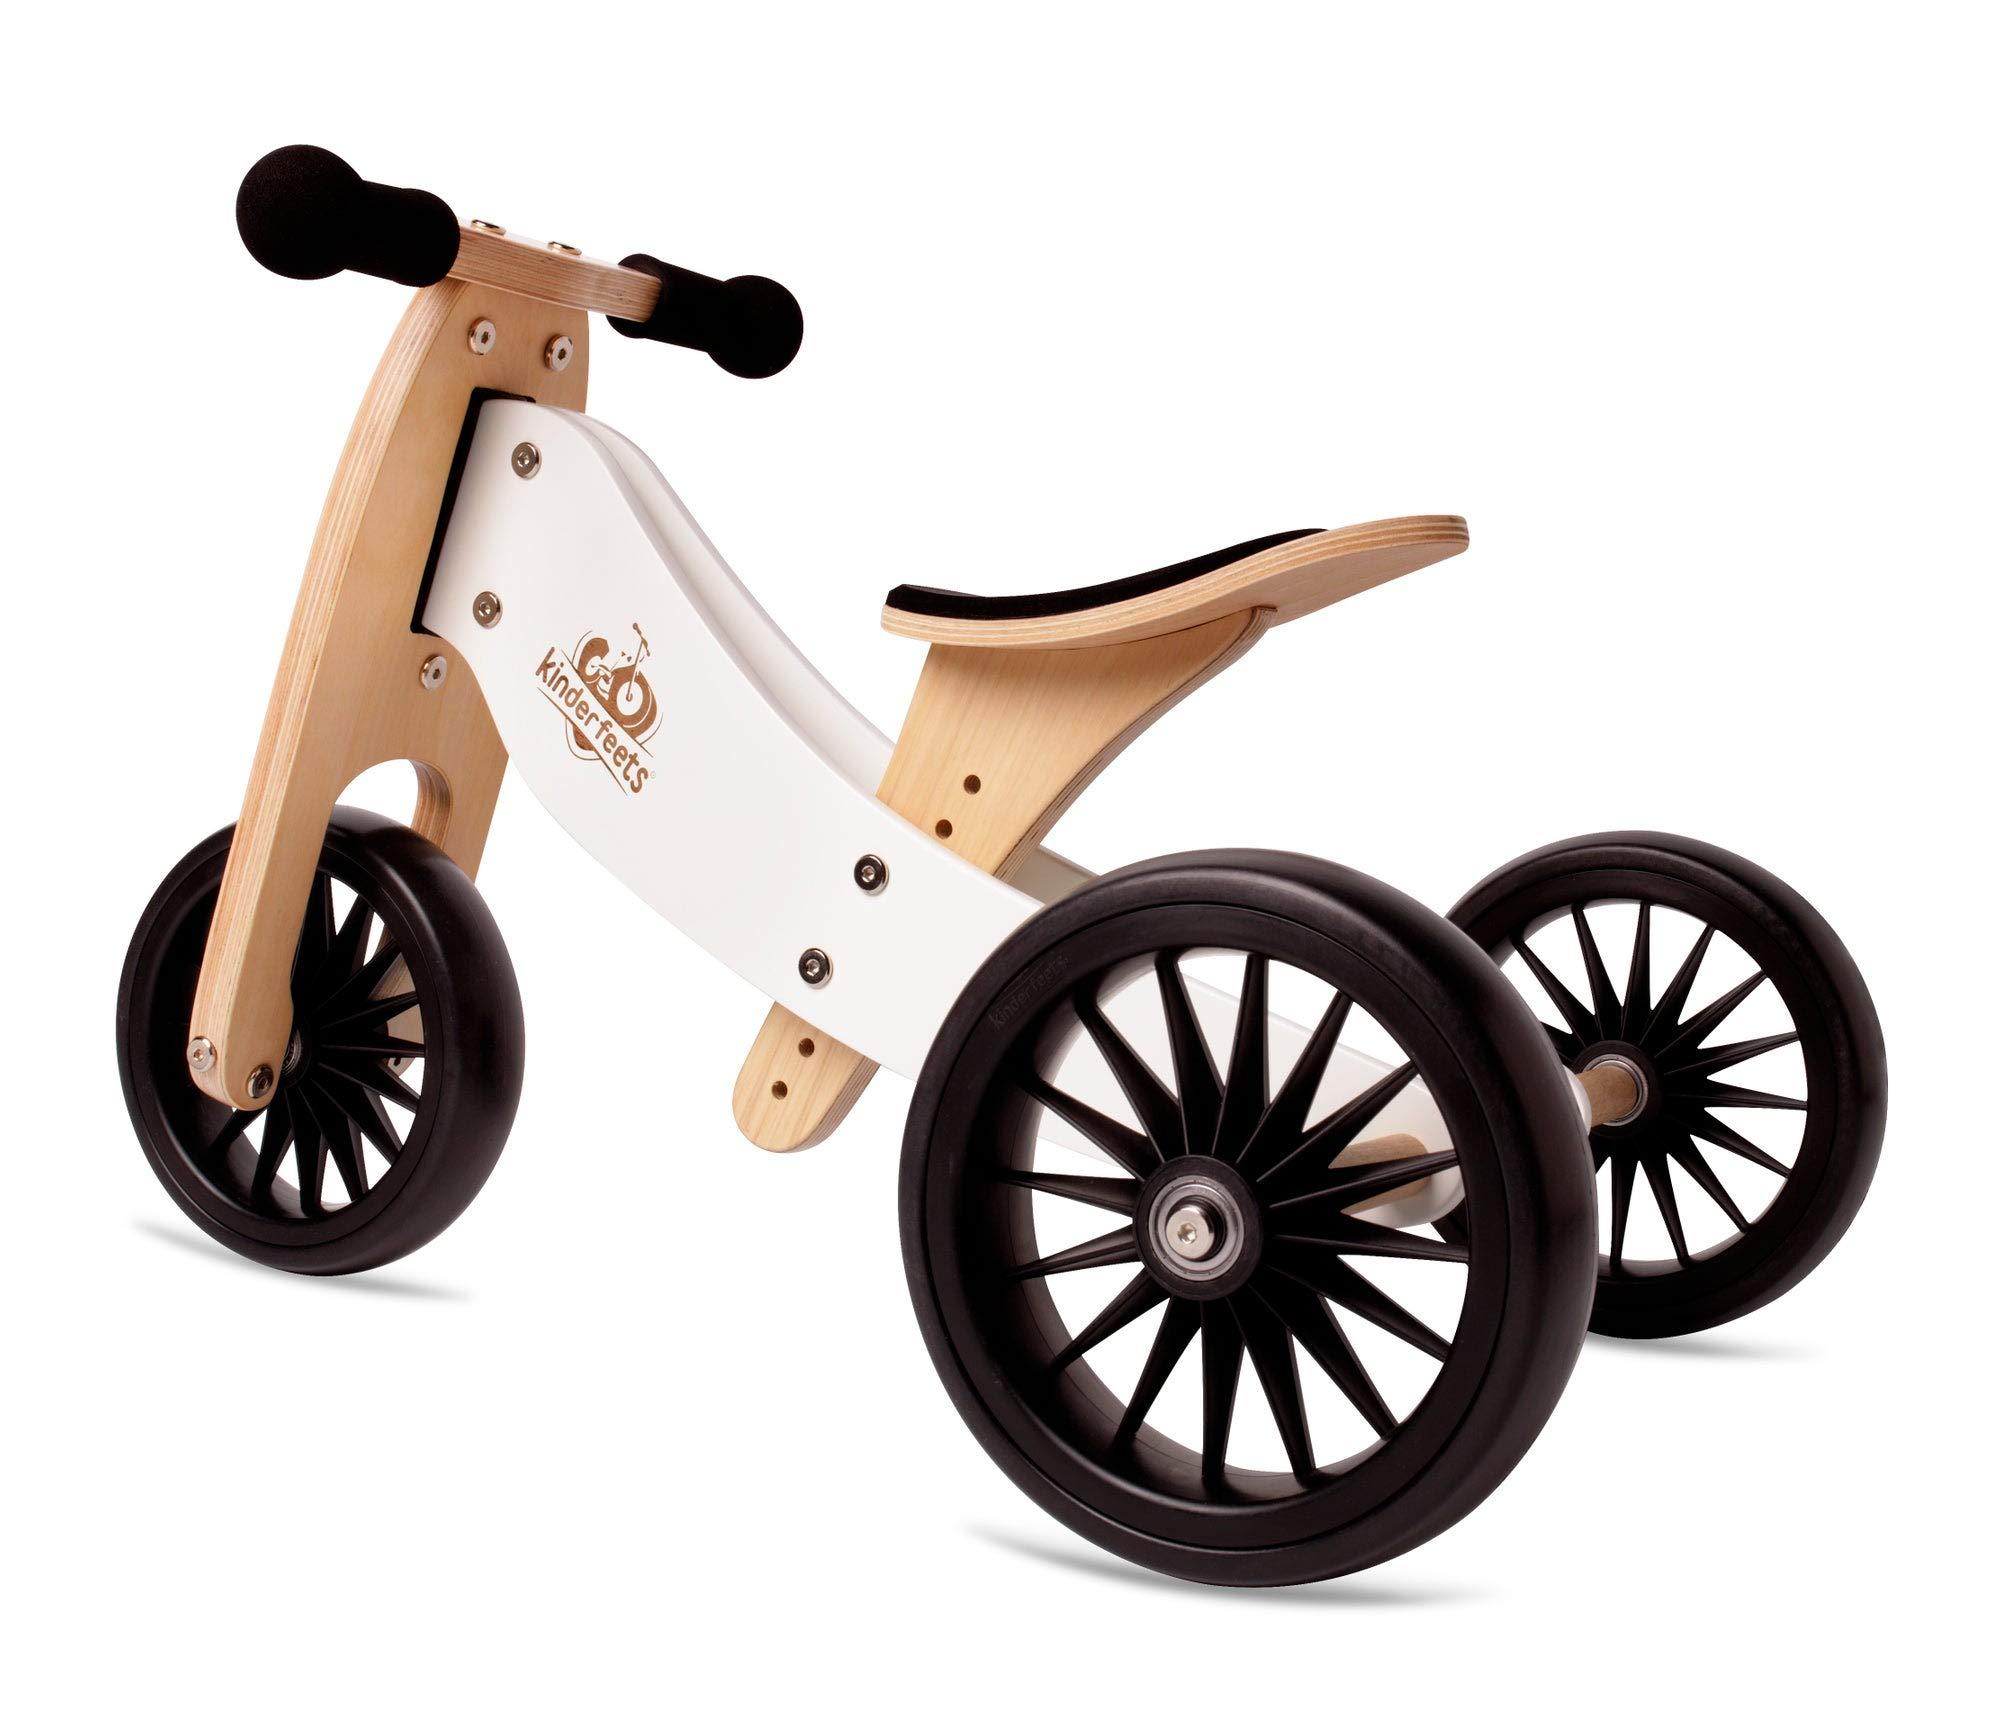 Kinderfeets, Tiny Tot Plus Balance Bike, 18-48 Months